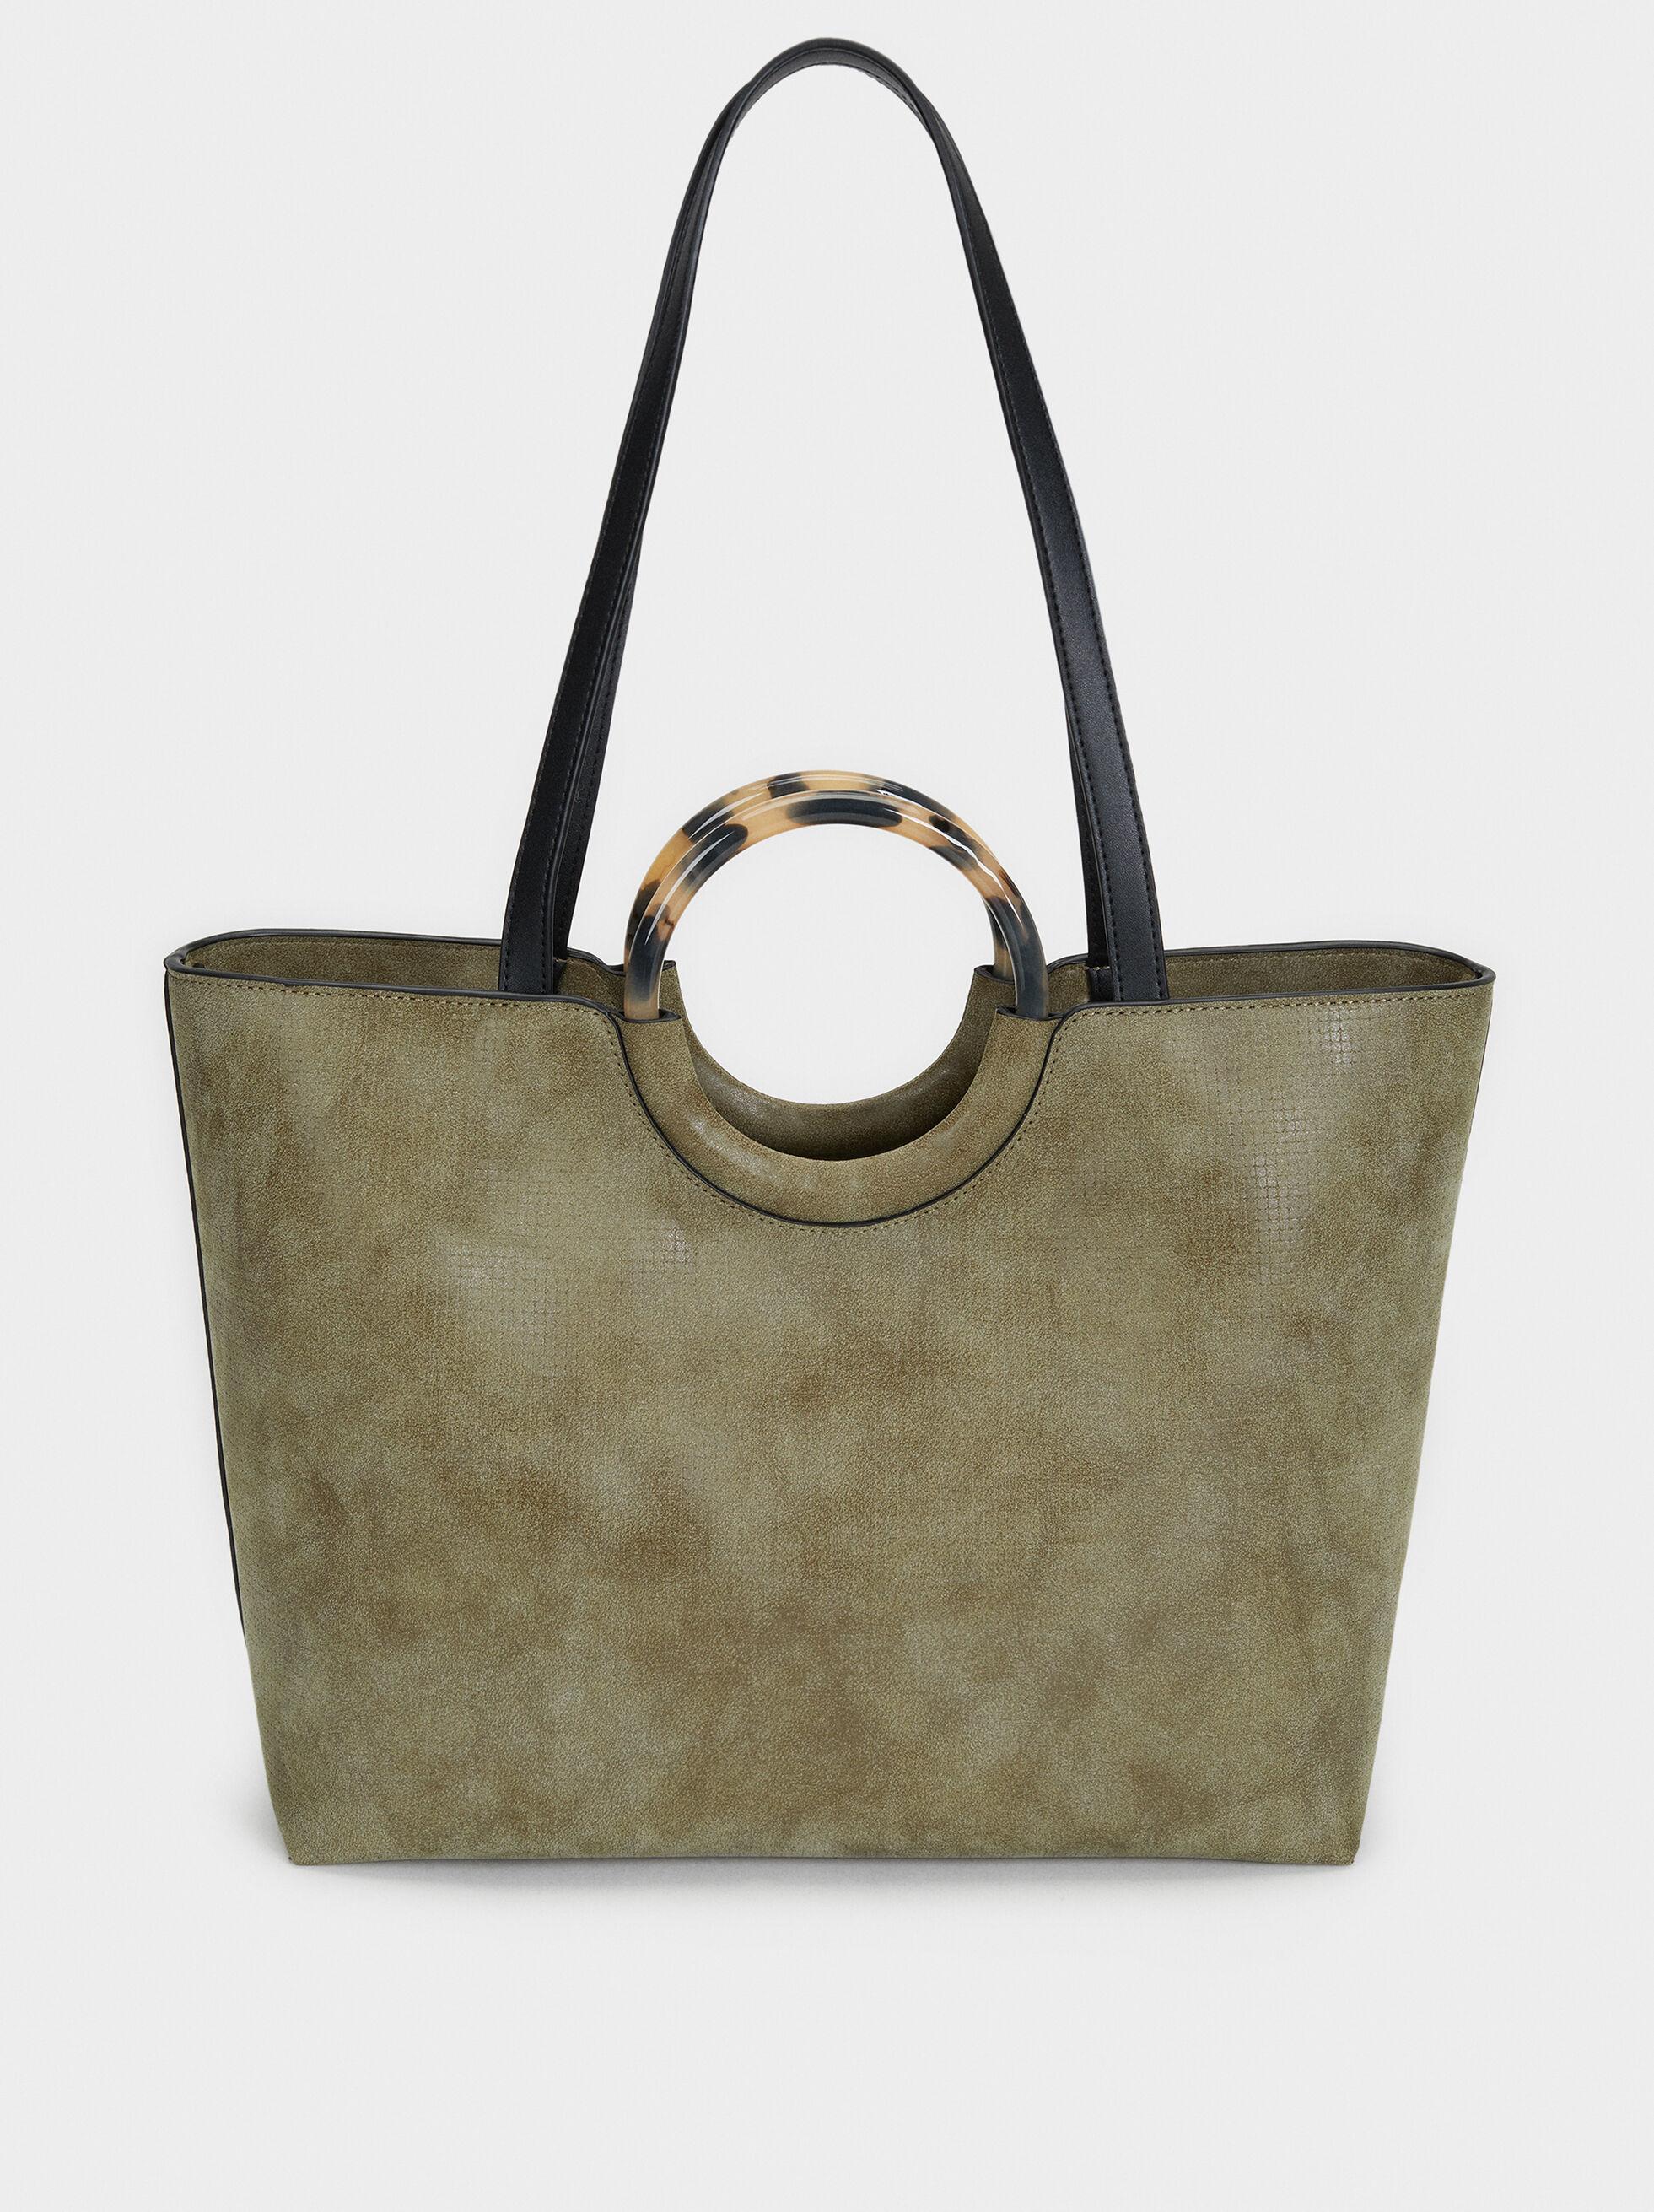 Tote Bag With Tortoiseshell Handle, Khaki, hi-res